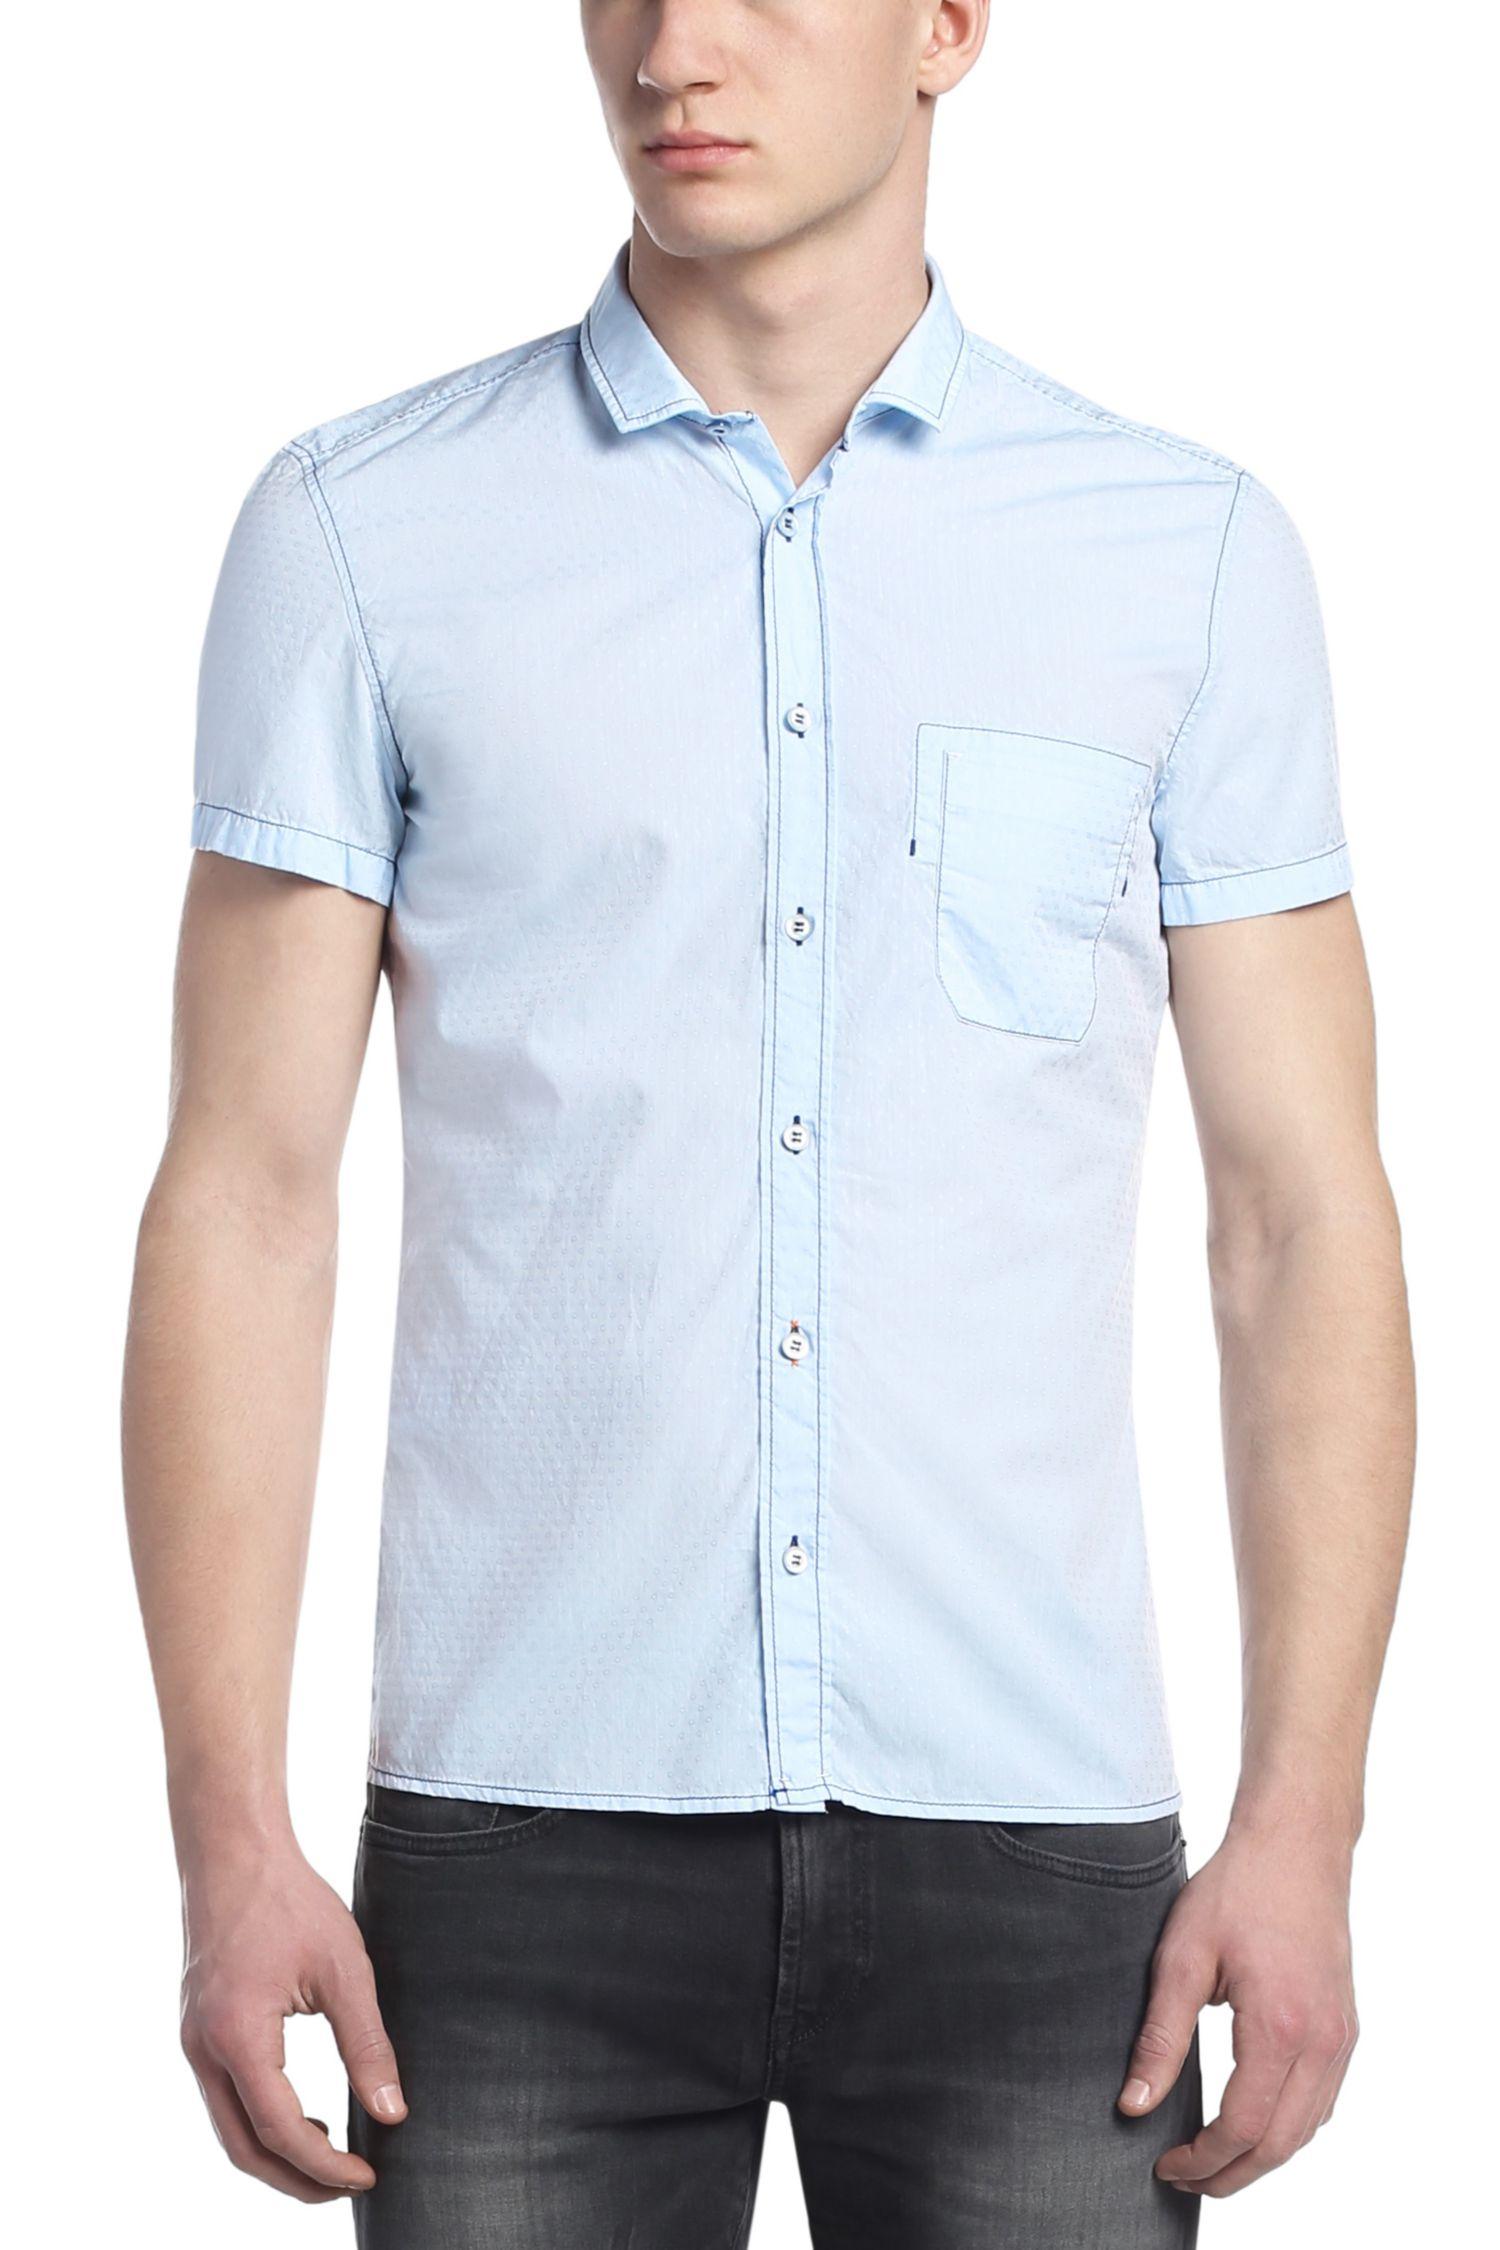 Hugo boss shirt herren sale